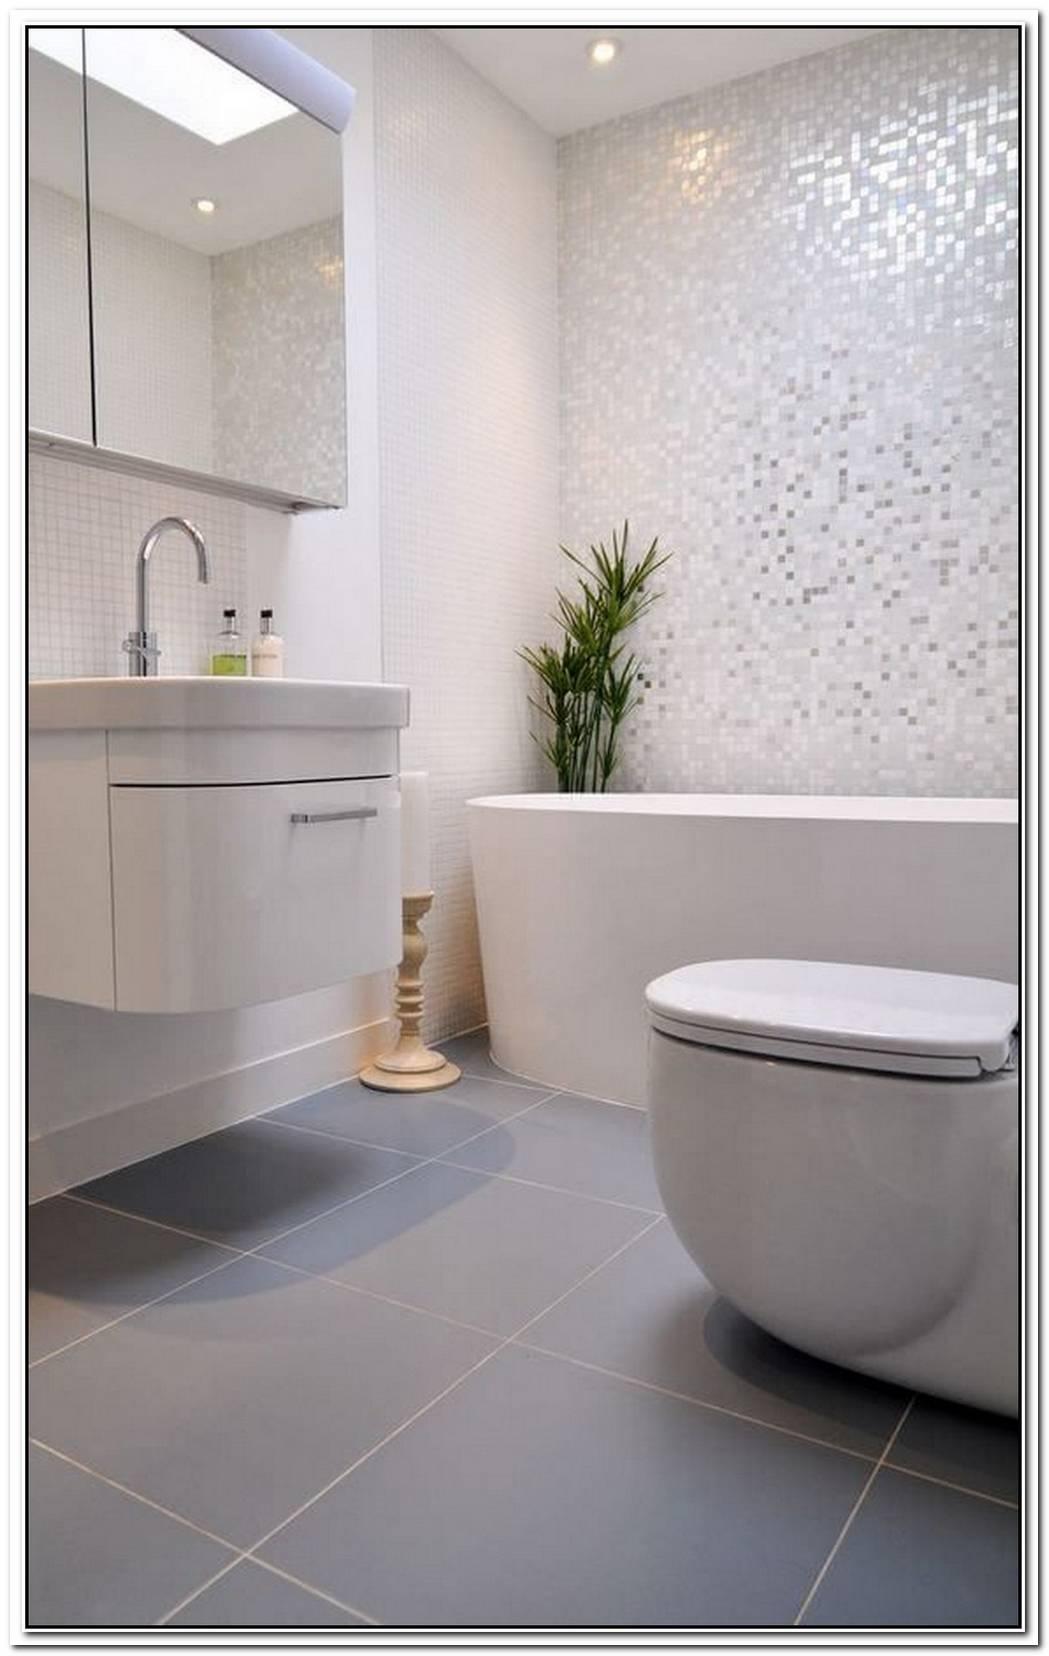 Bathroom Tiled Modernist